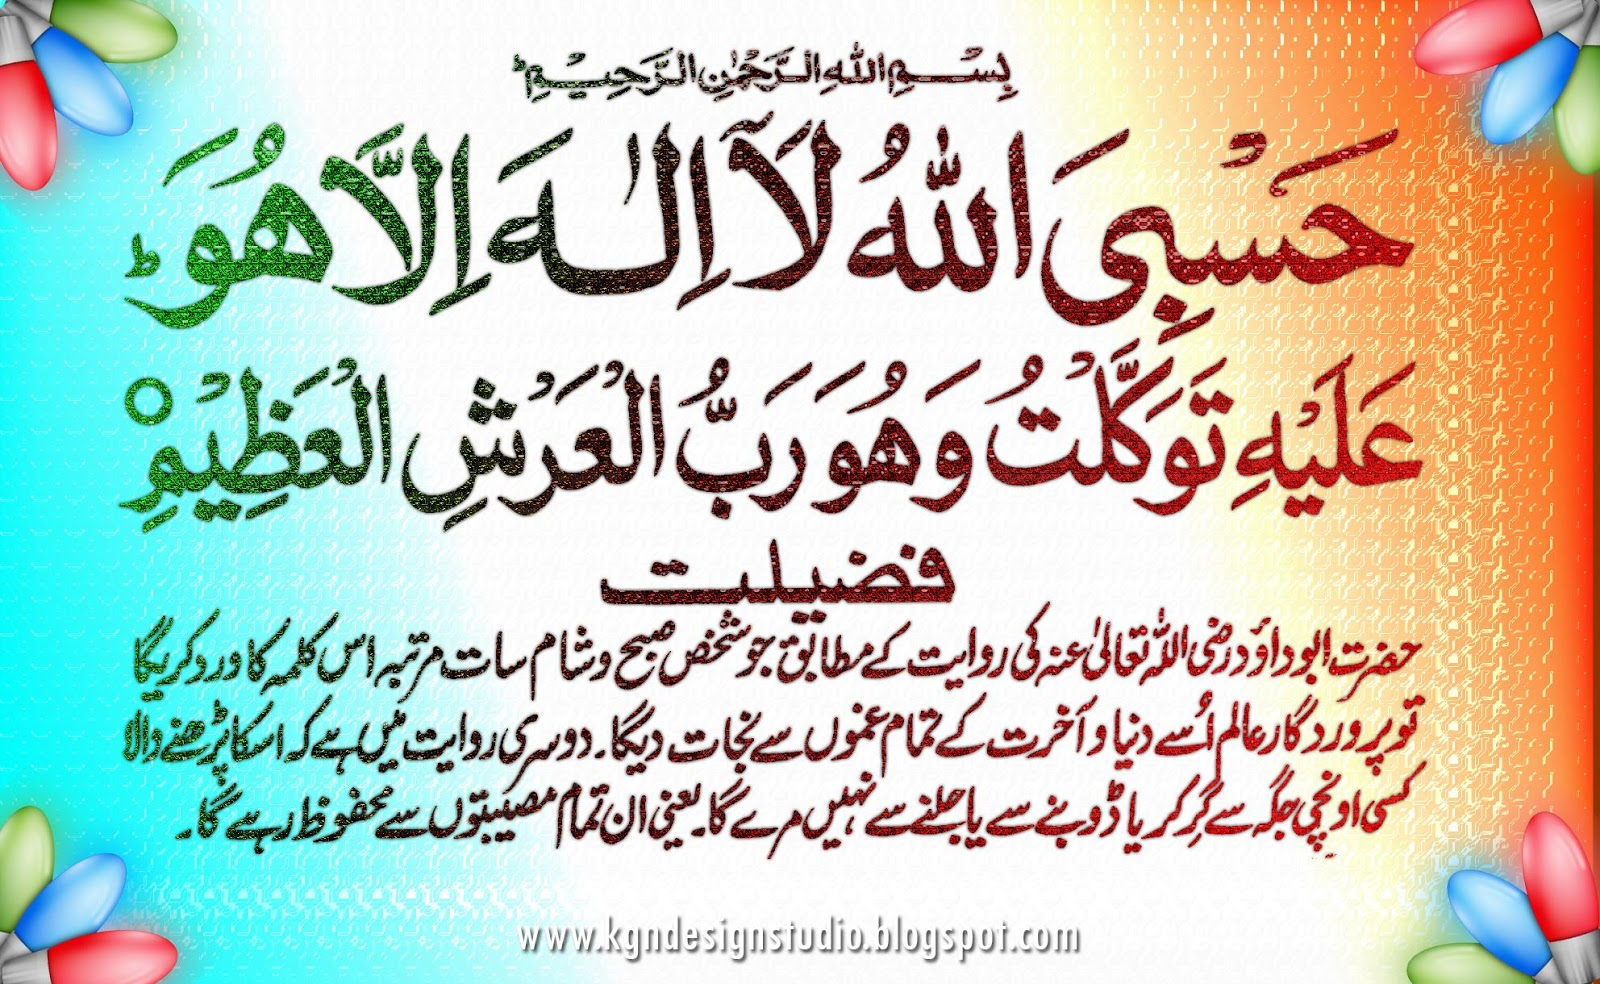 http://1.bp.blogspot.com/-ih6t892J634/UO-yxnWpraI/AAAAAAAACnI/dIxQnr1cl9Q/s1600/Urdu+Hadees-8.jpg